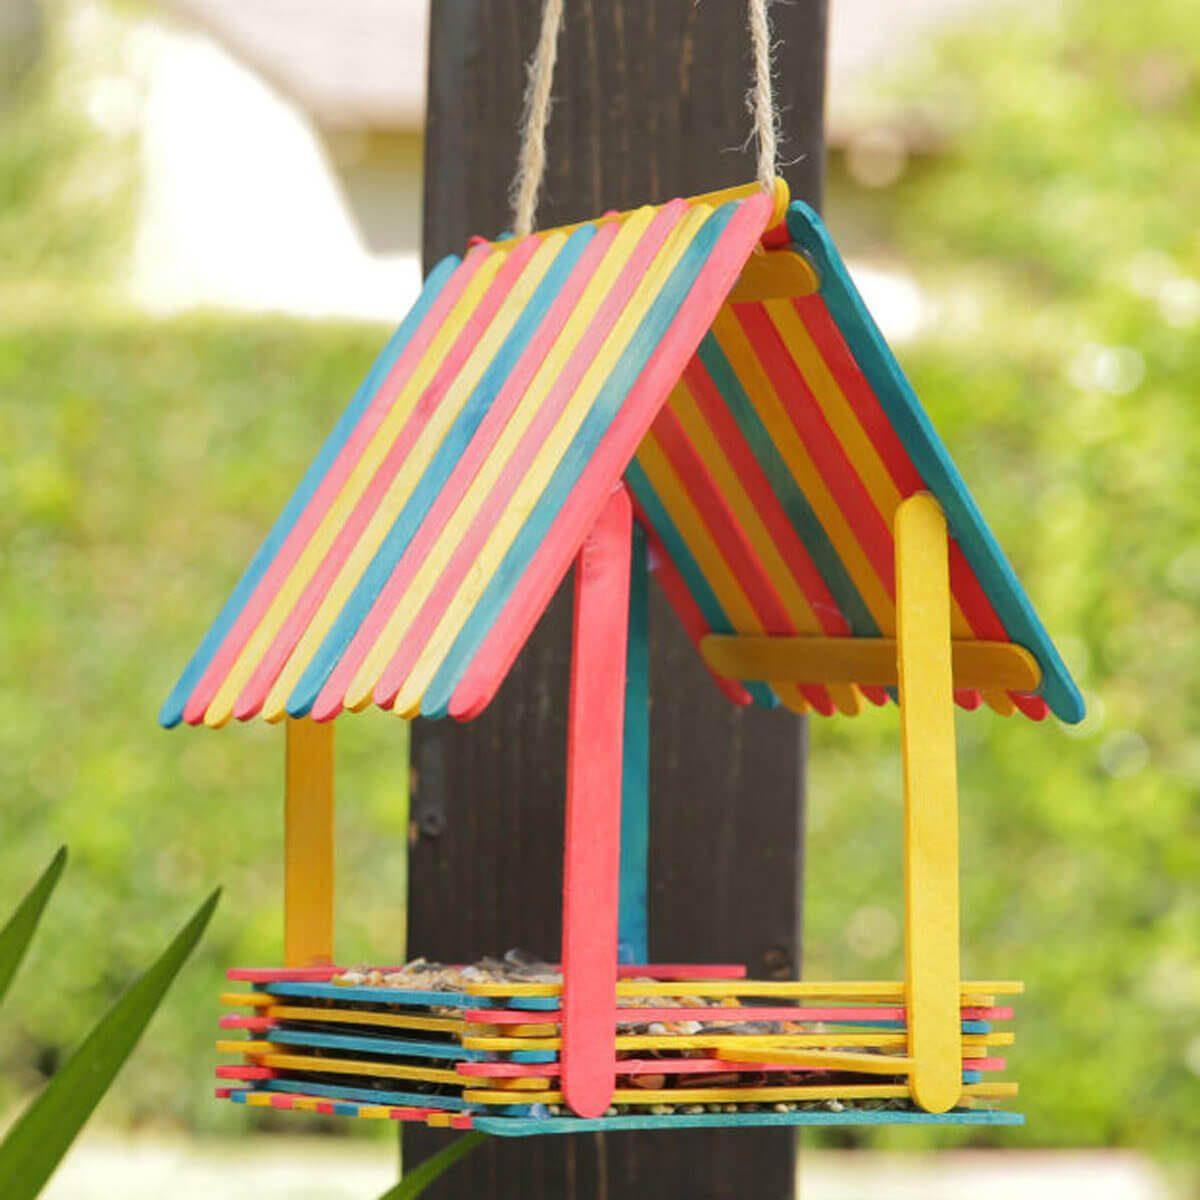 Popsicle Stick Birdhouse